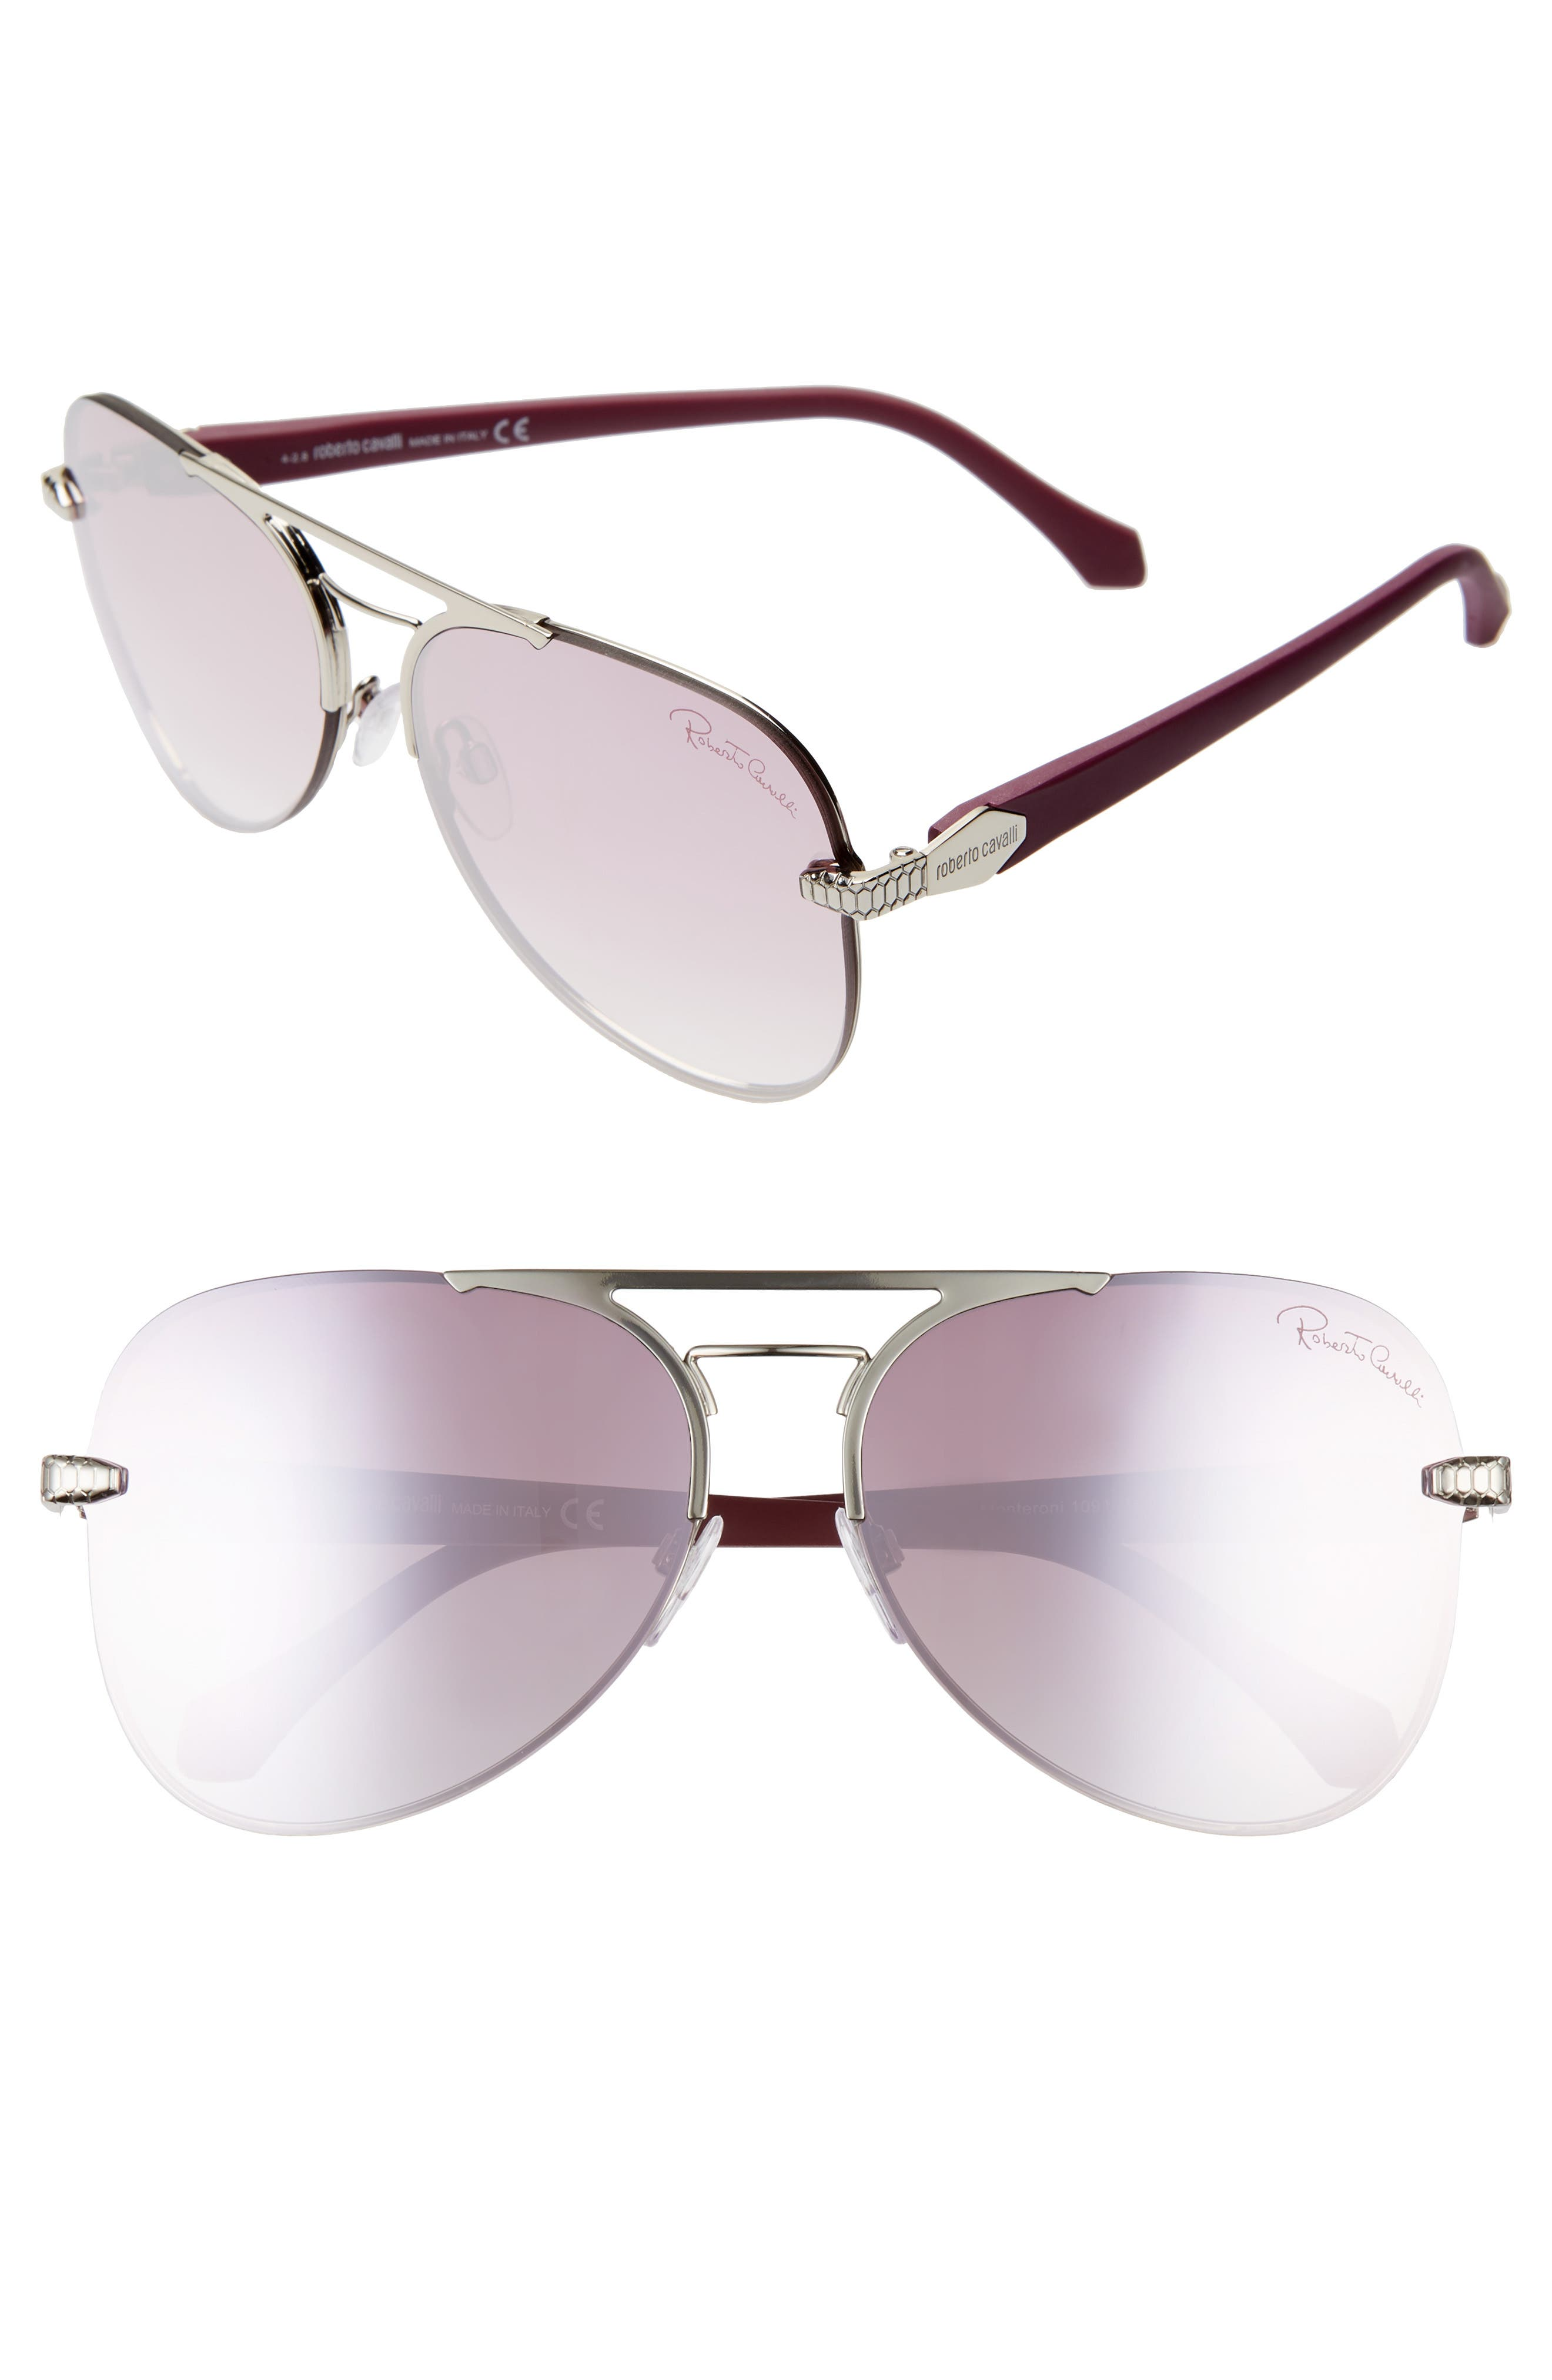 Roberto Cavalli 60Mm Mirrored Aviator Sunglasses - Shiny Palladium/ Bordeaux Mir